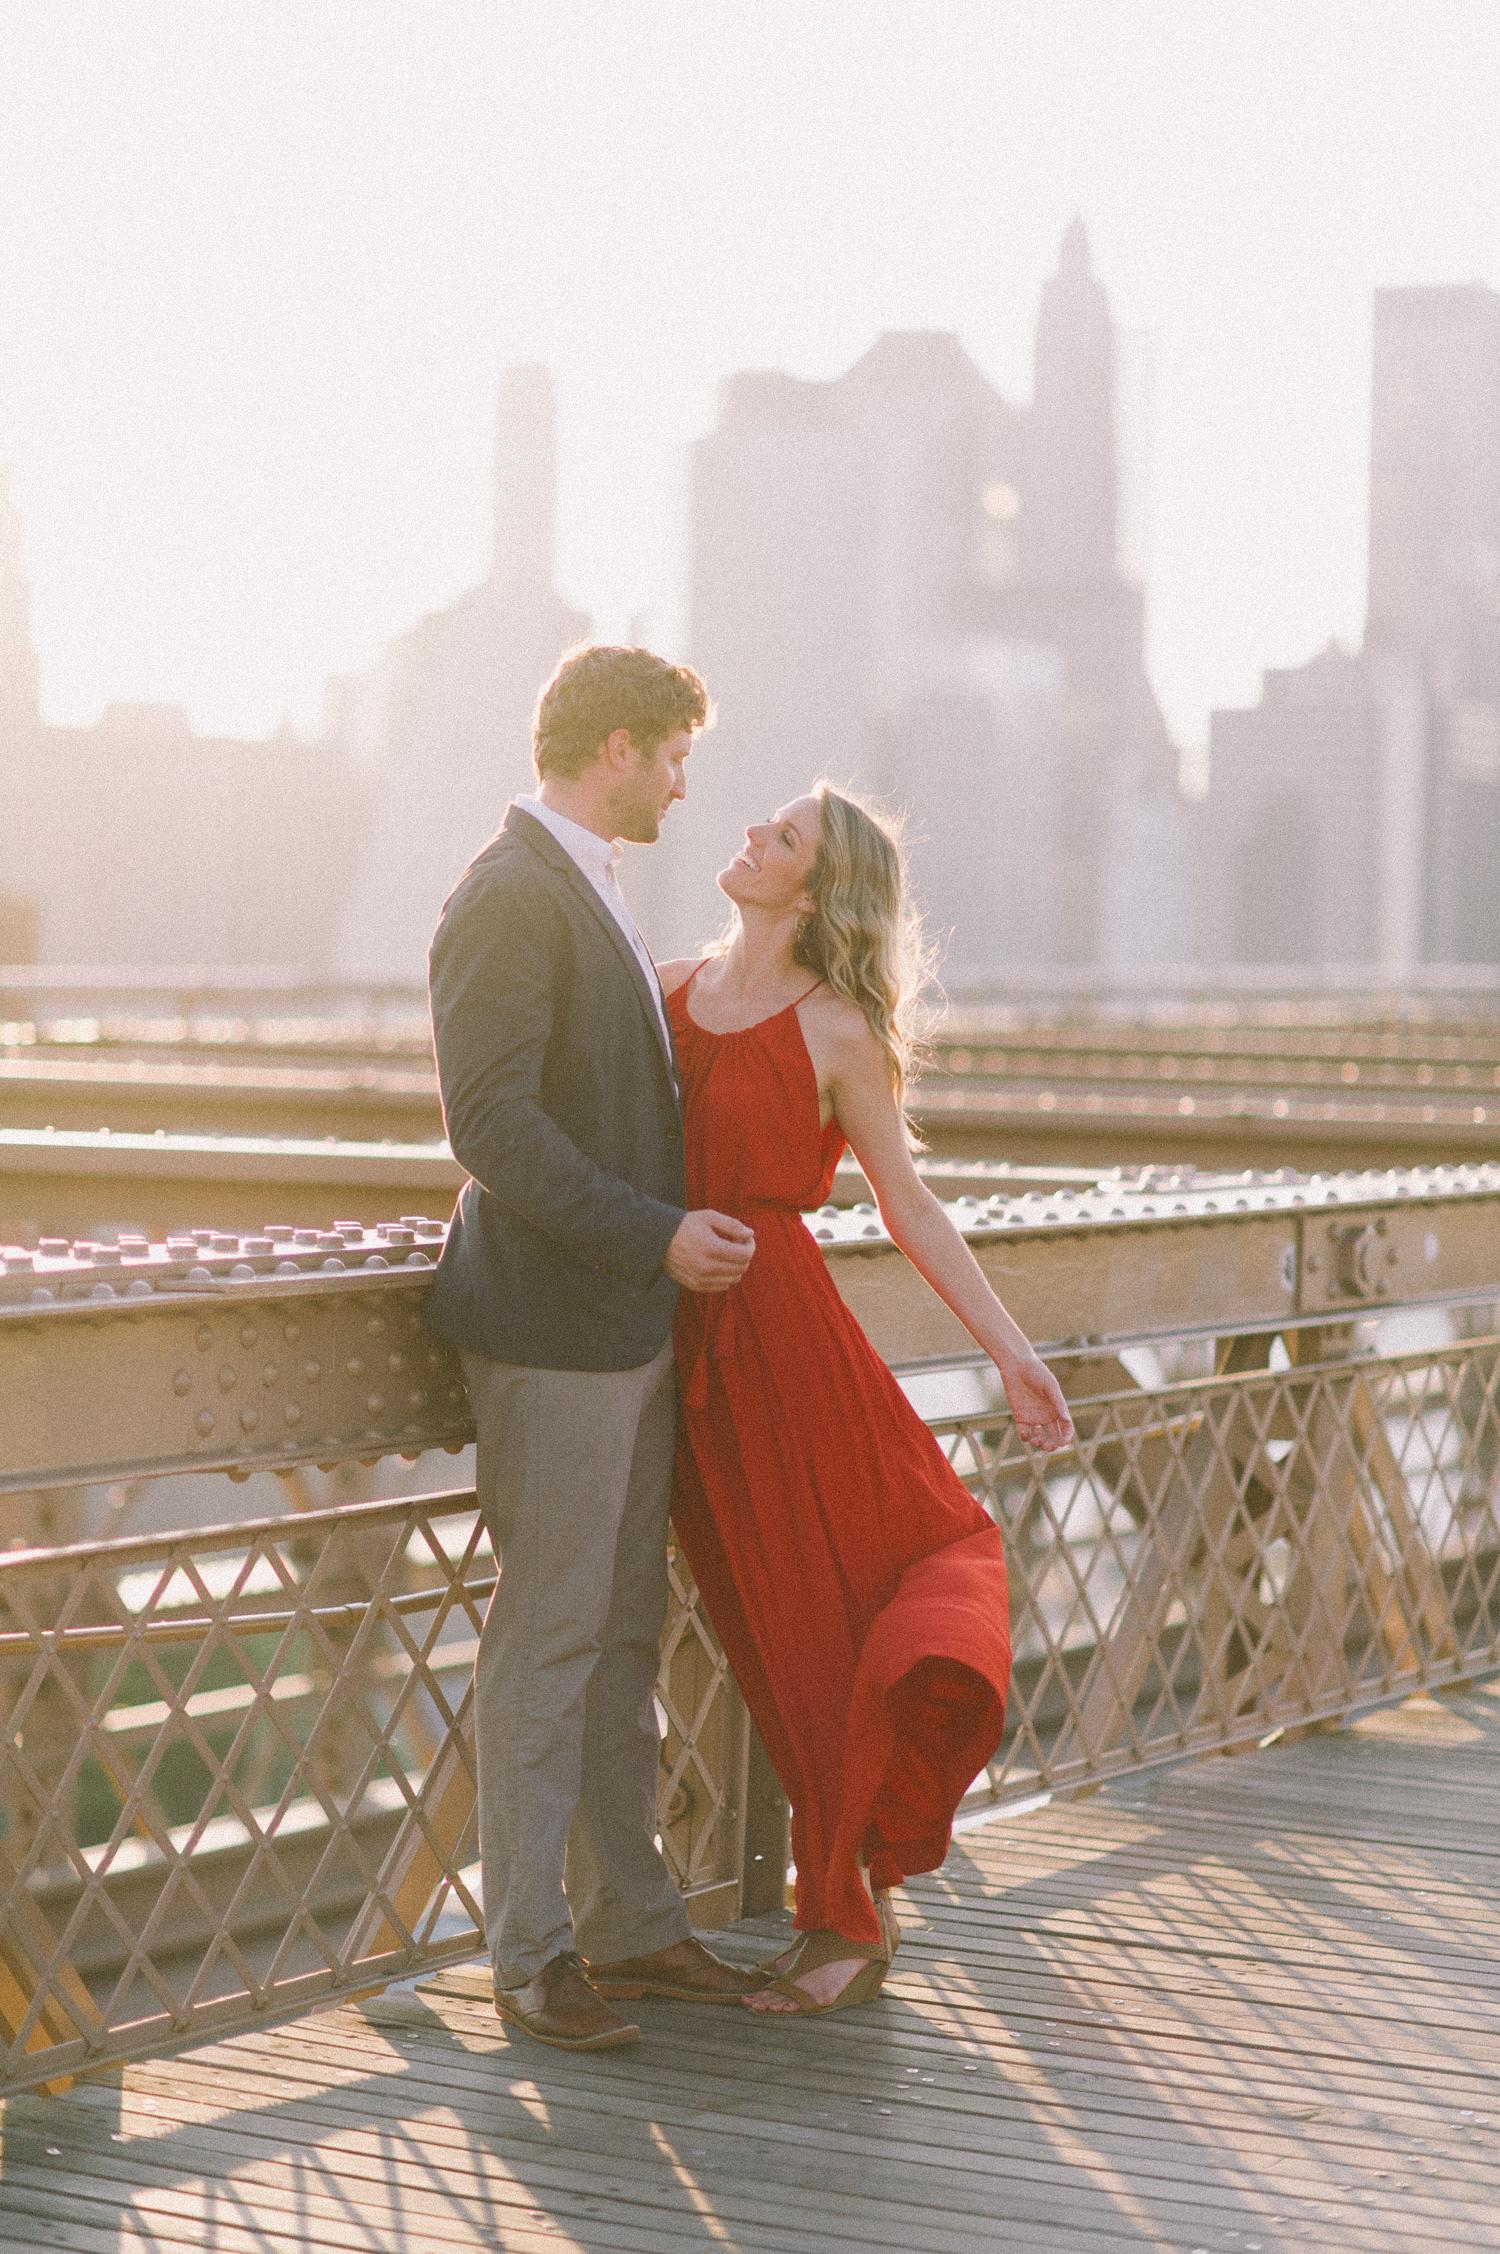 BrooklynBridge.Dumbo.Engagements16.jpg